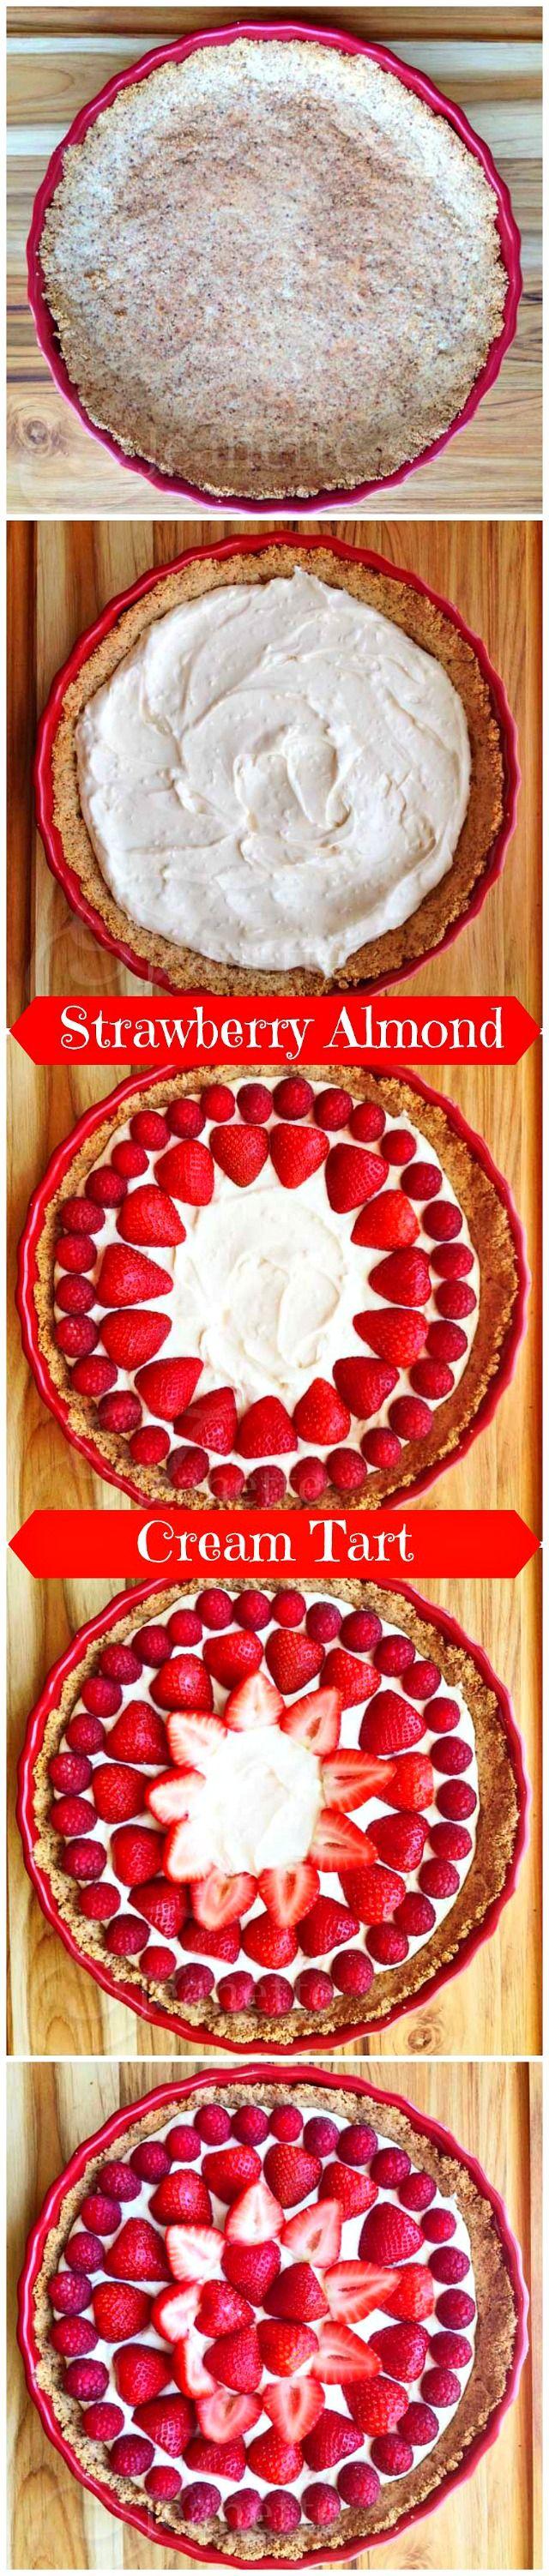 How To Make Strawberry Almond Cream Tart © Jeanette's Healthy Living #glutenfree #dessert #strawberry